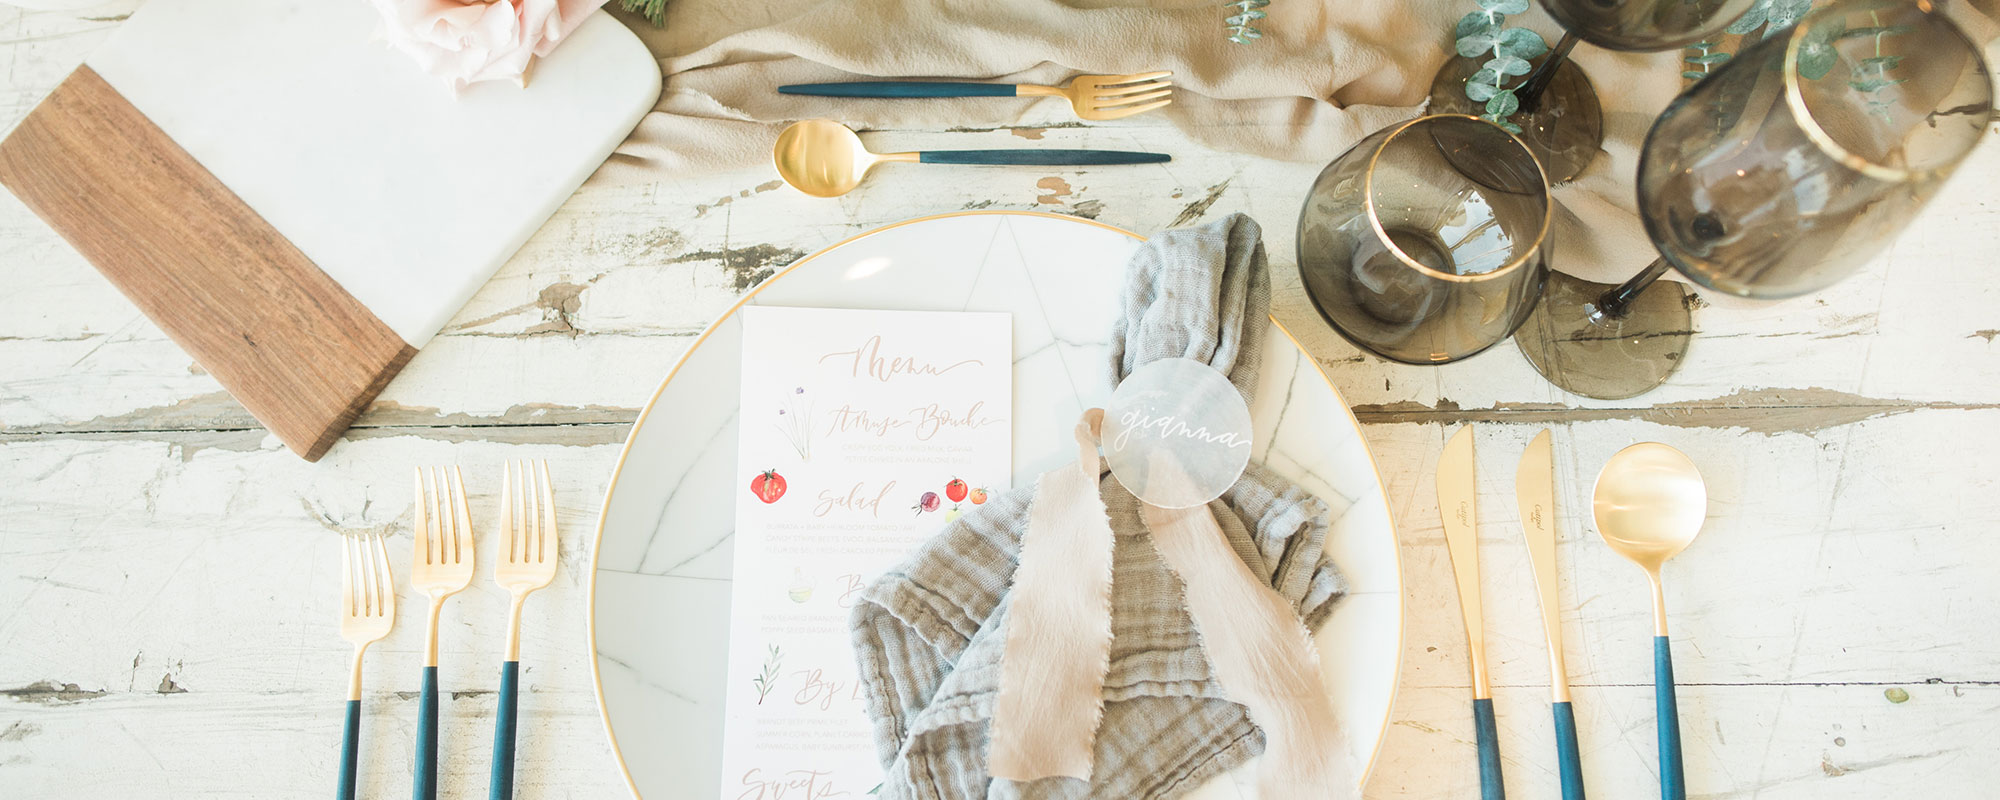 Huntington Bay Club - Place Setting - WeddingCompass.com